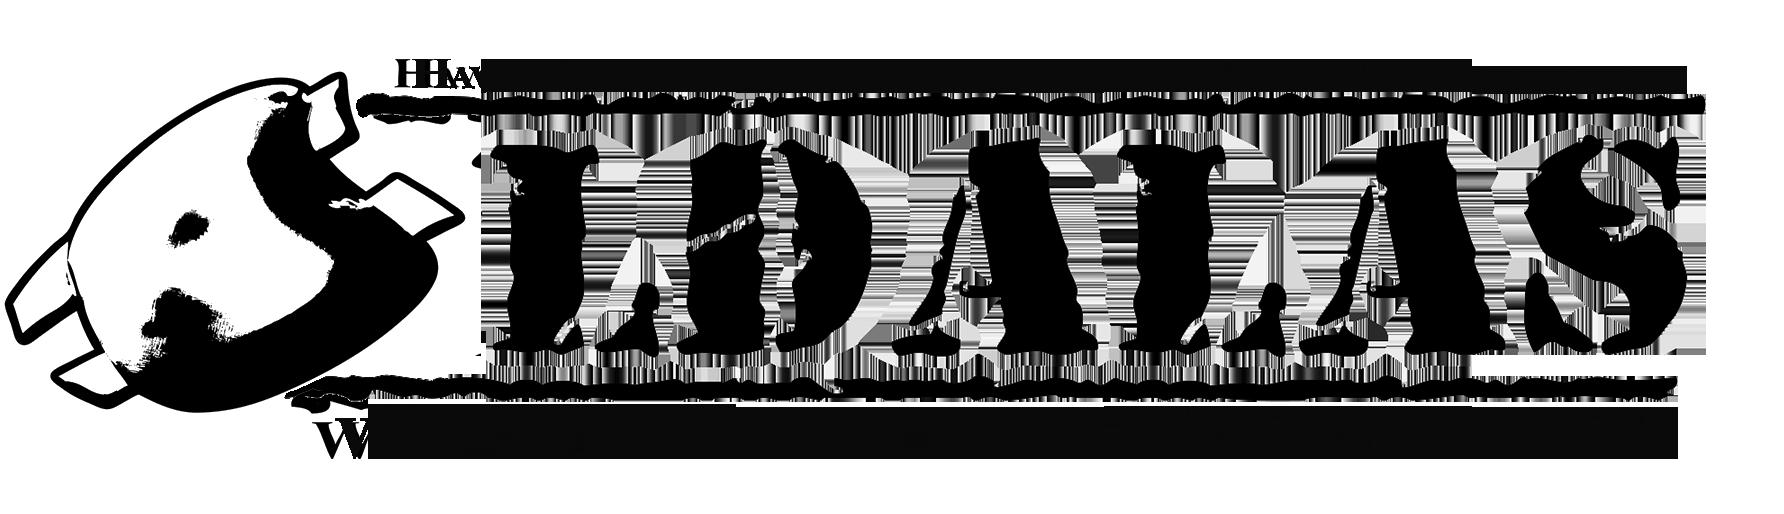 ff_oldalas_magazin_logo_